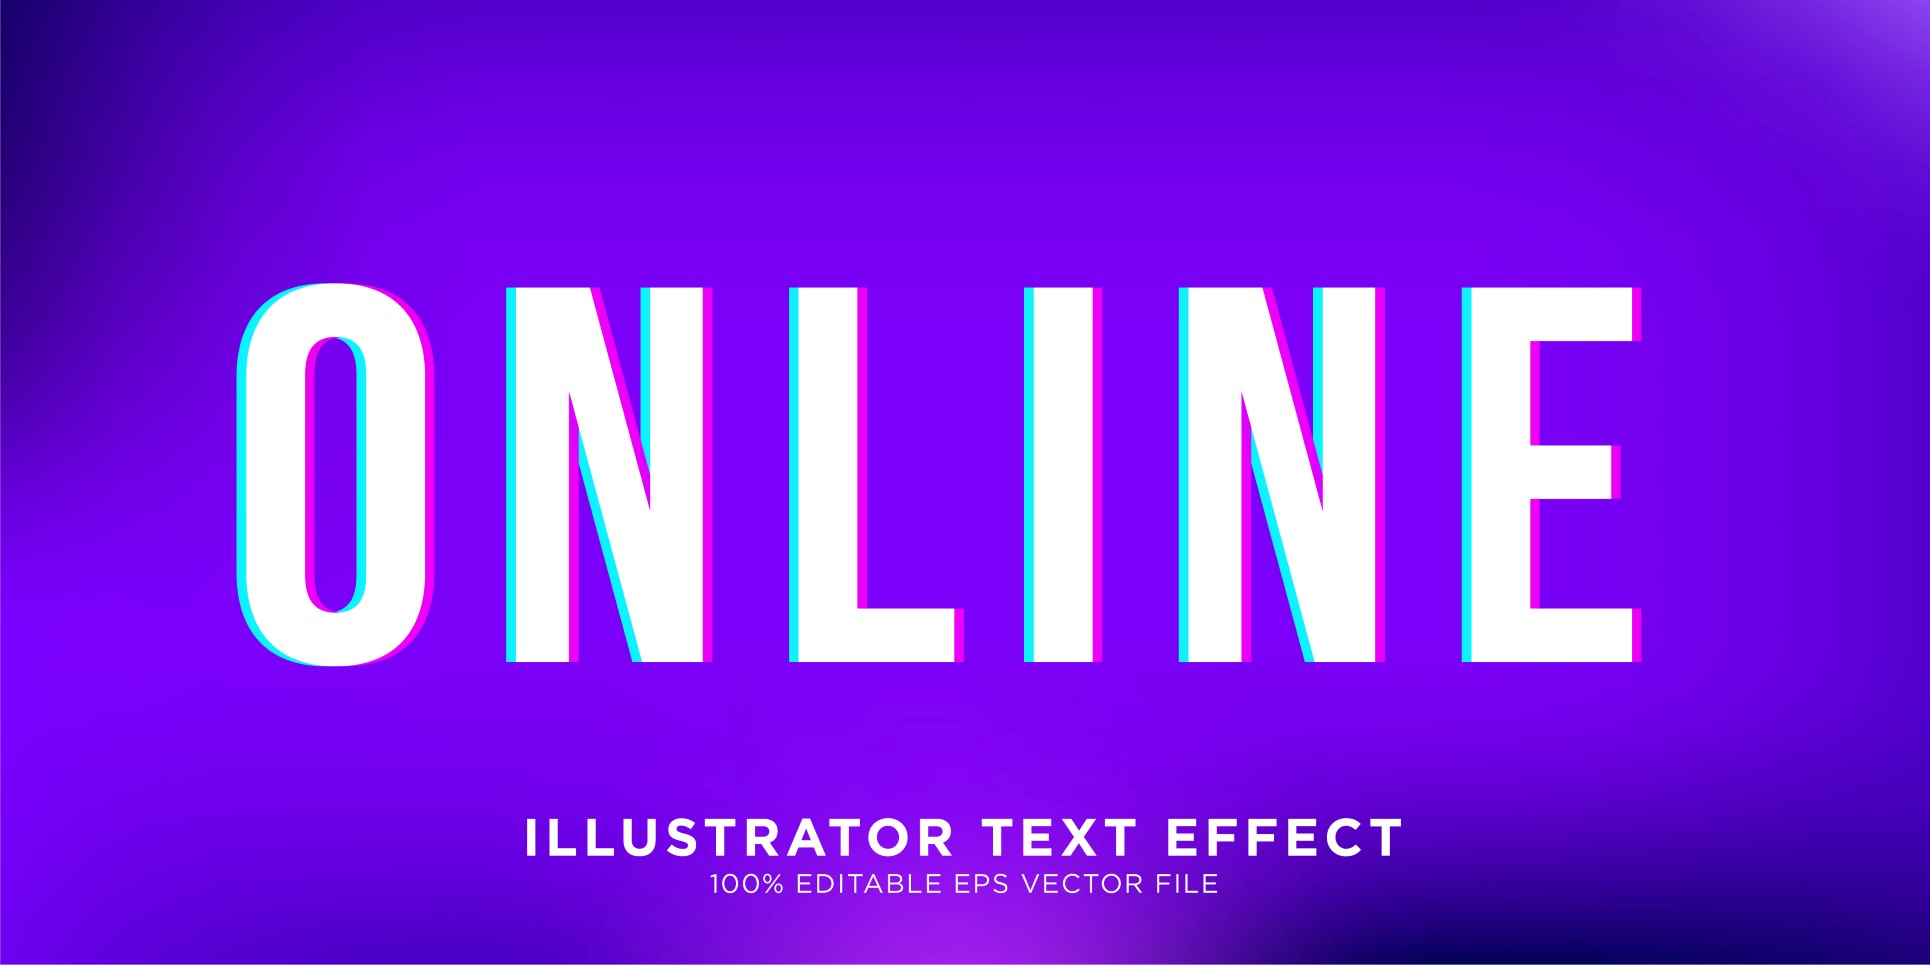 Online illustrator Text Effect Illustration